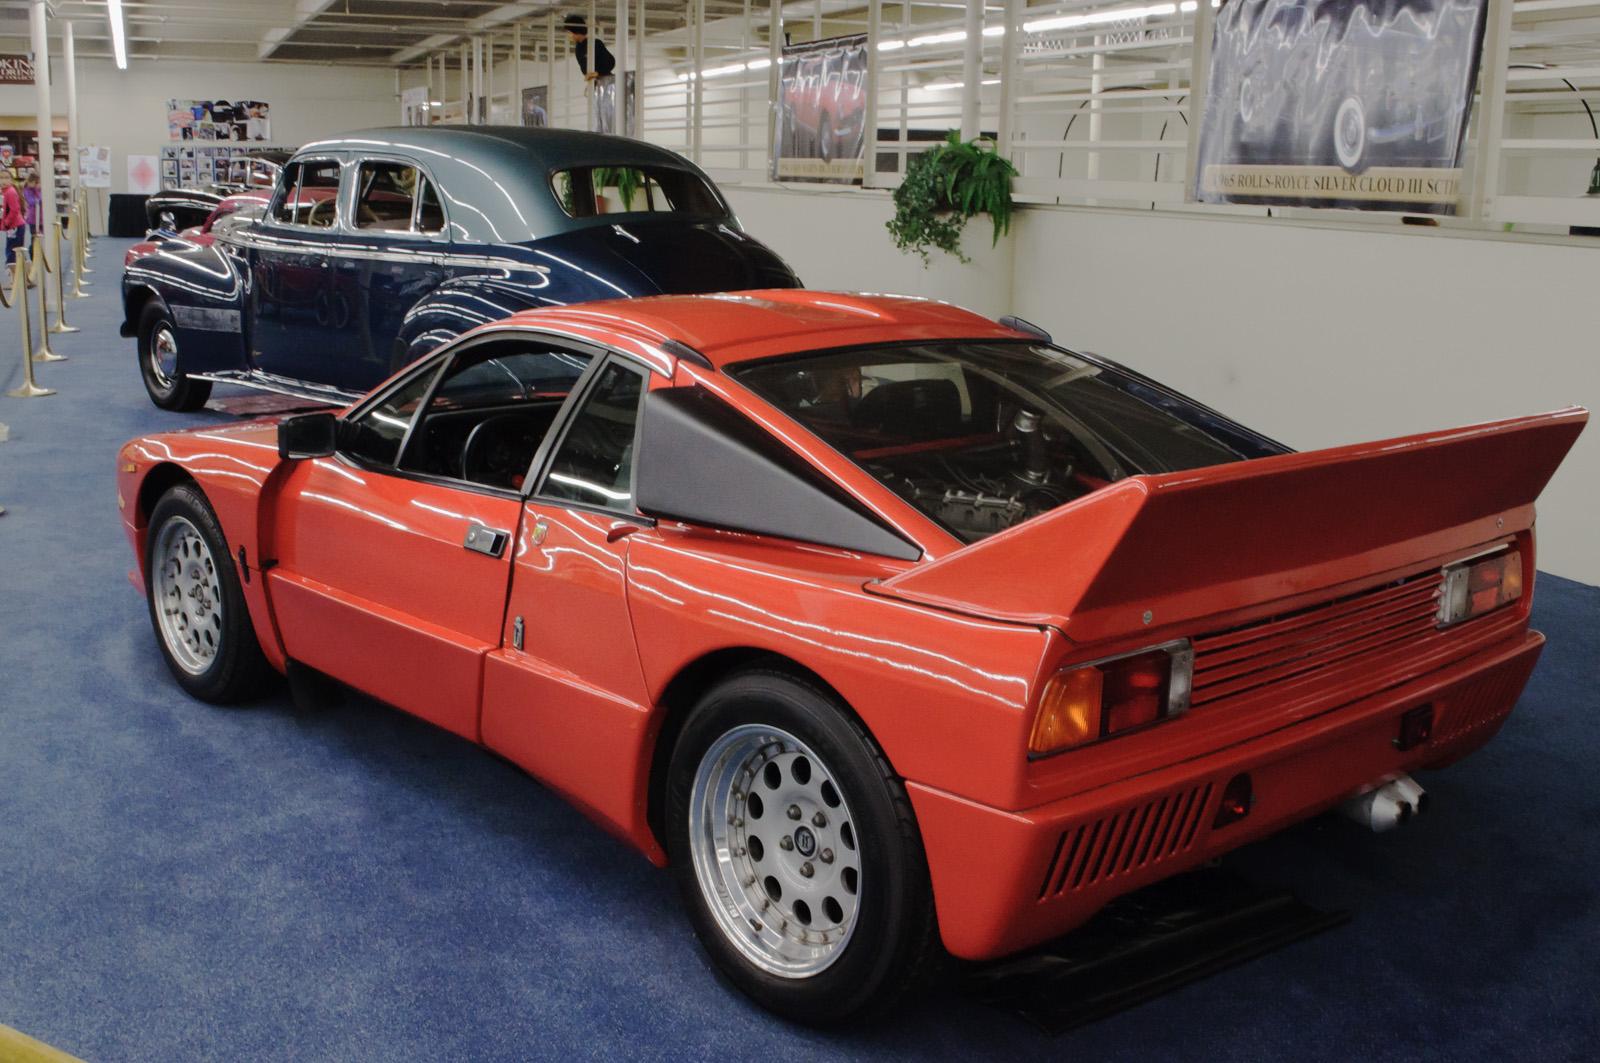 Cars For Sale In Las Vegas >> File:1983 Lancia 037 (Germany) (8391188320).jpg - Wikimedia Commons